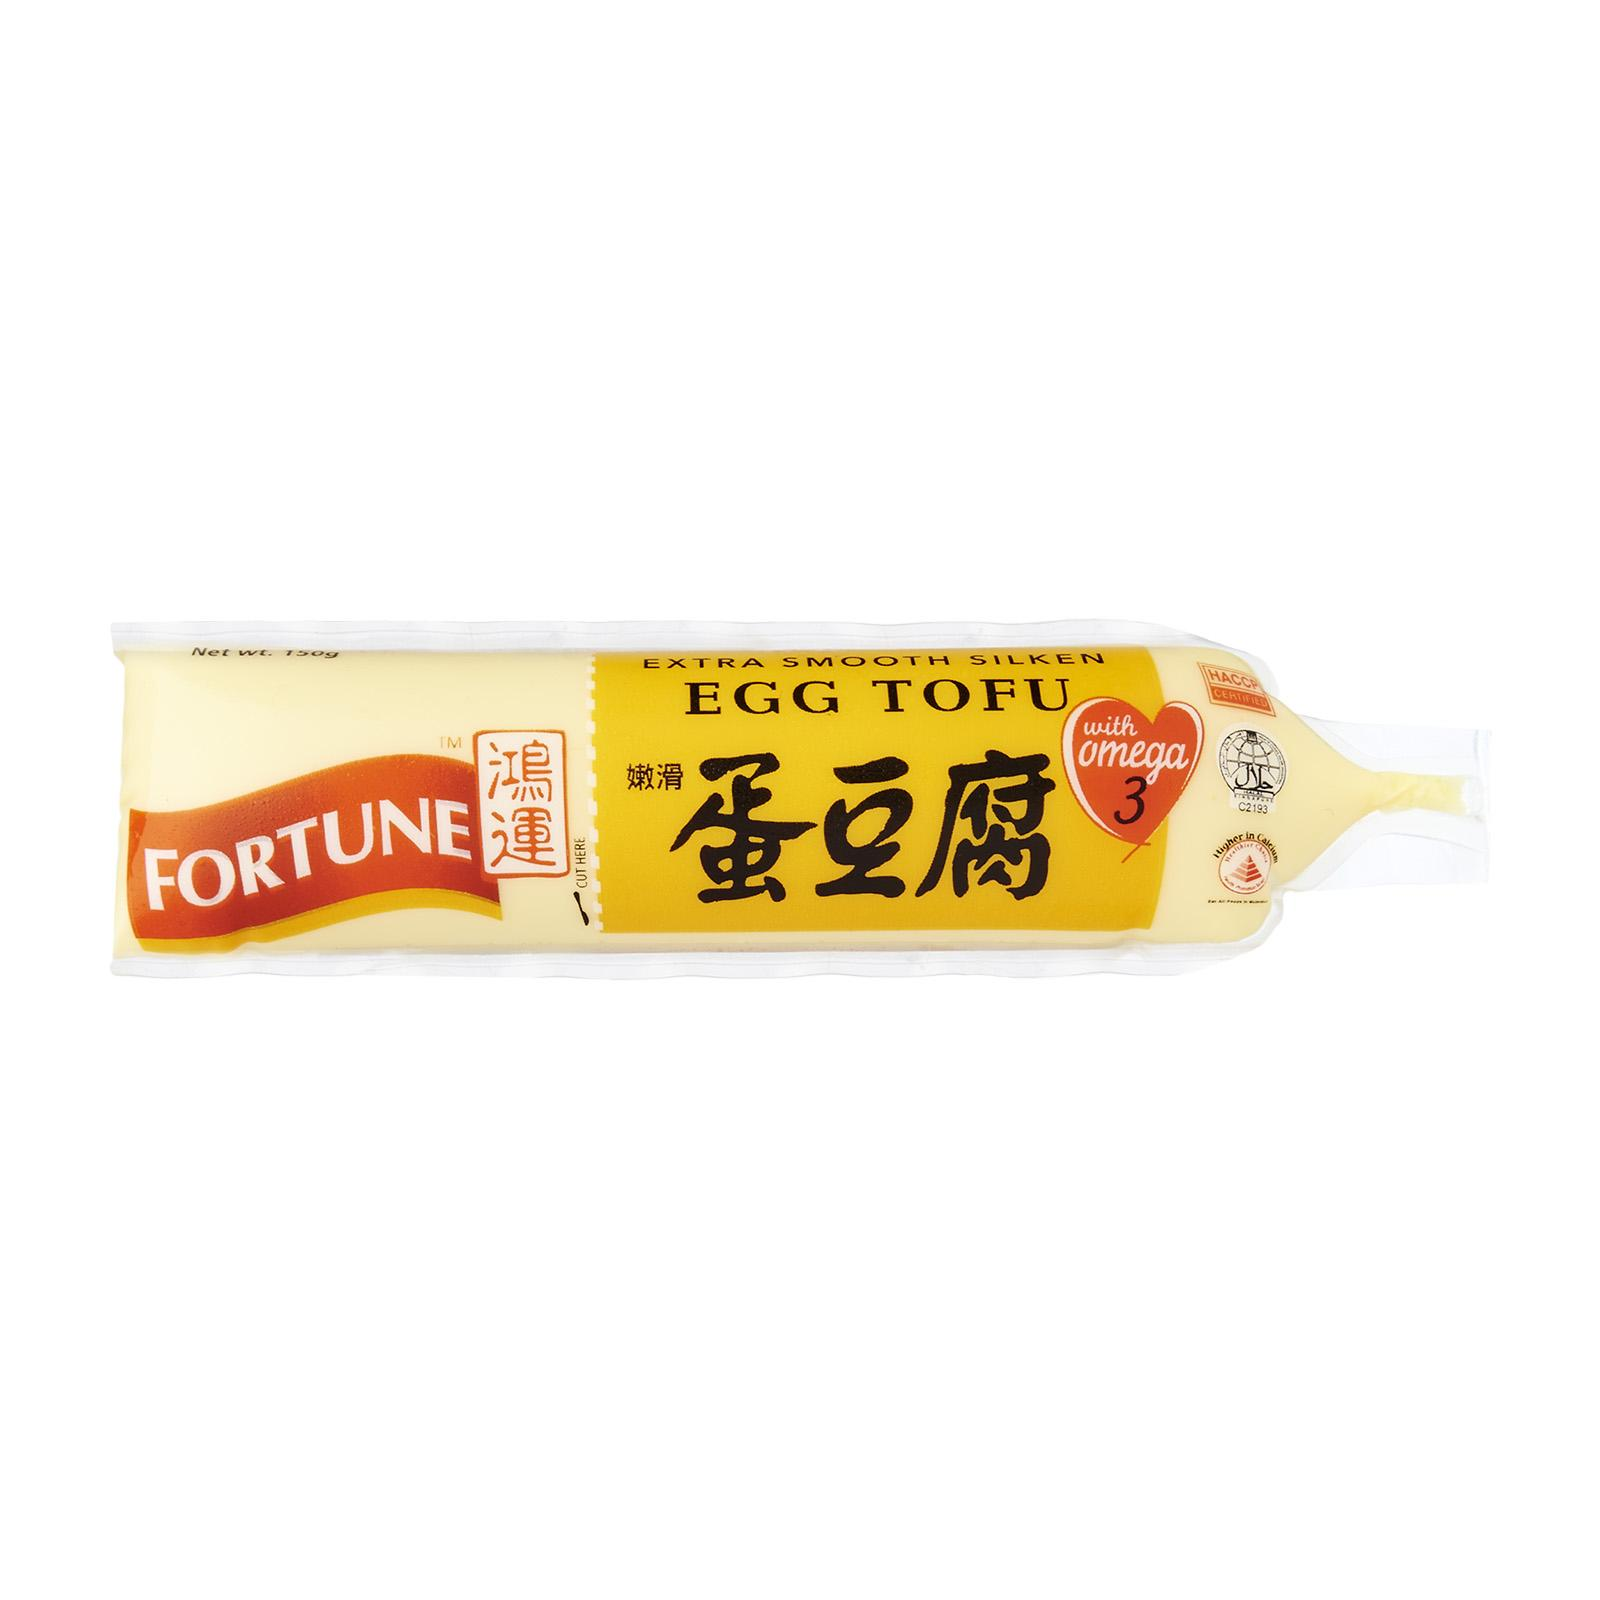 Fortune Egg Tofu With Omega